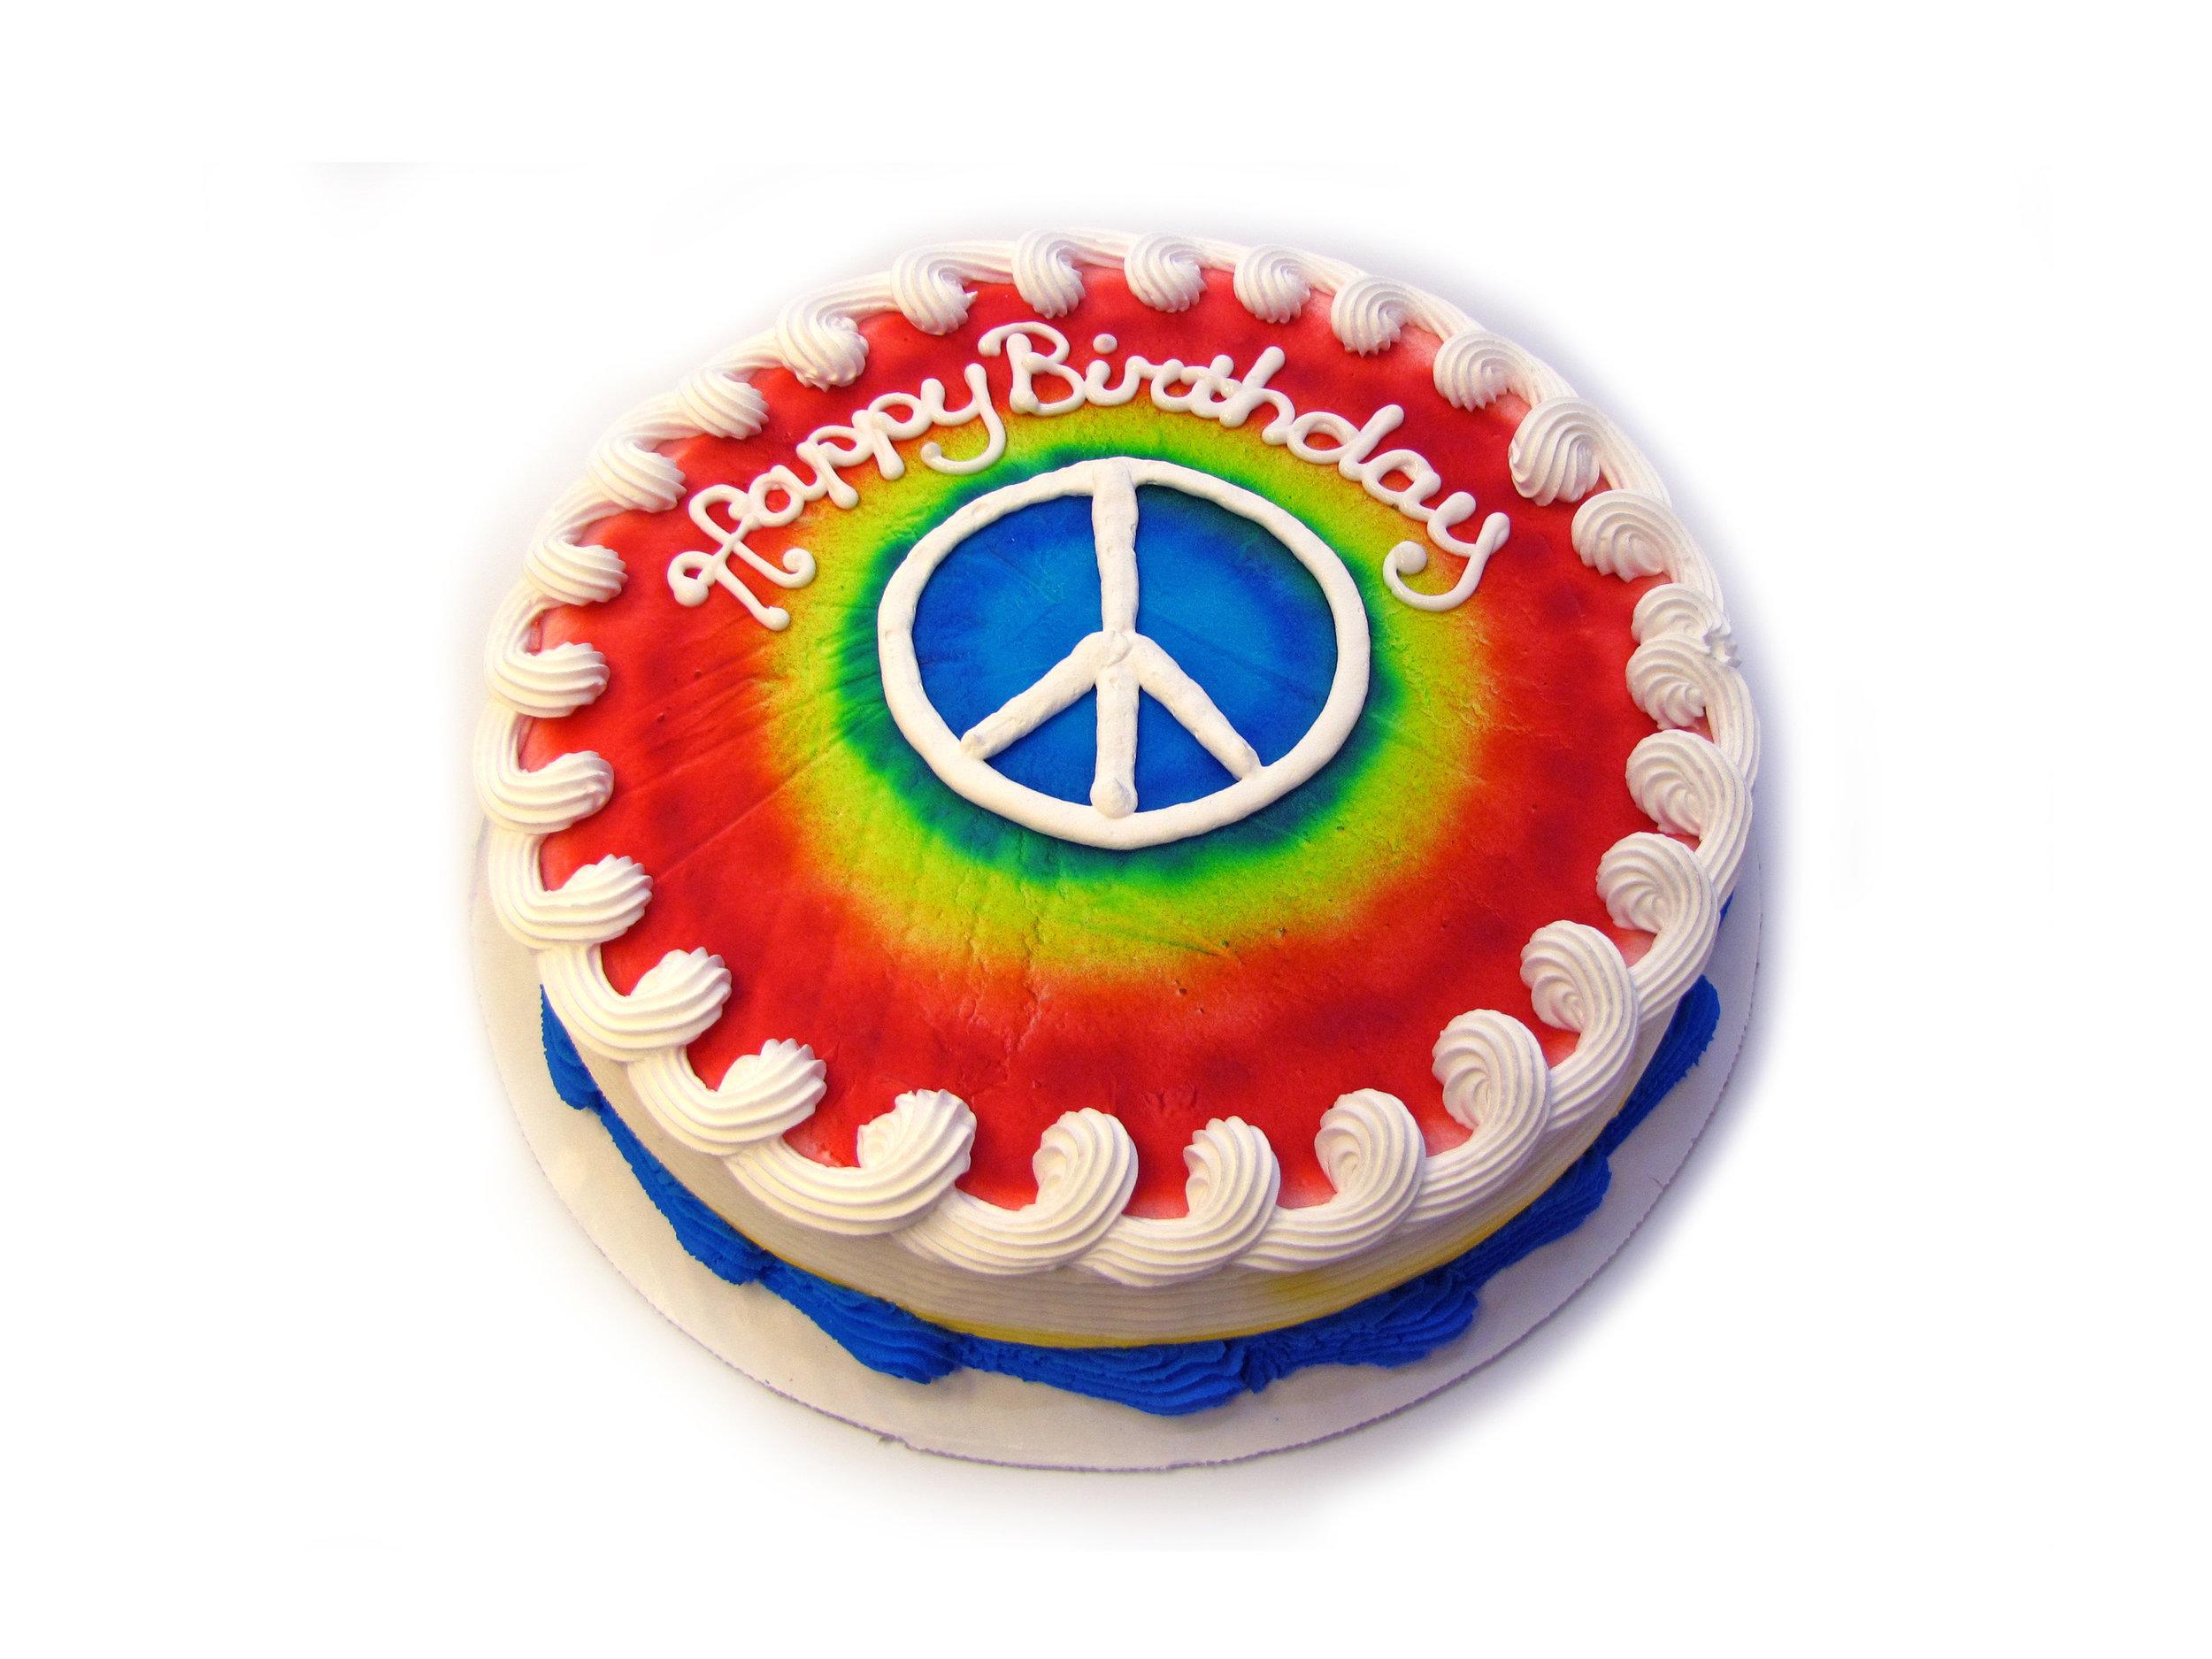 Woodstock Chill